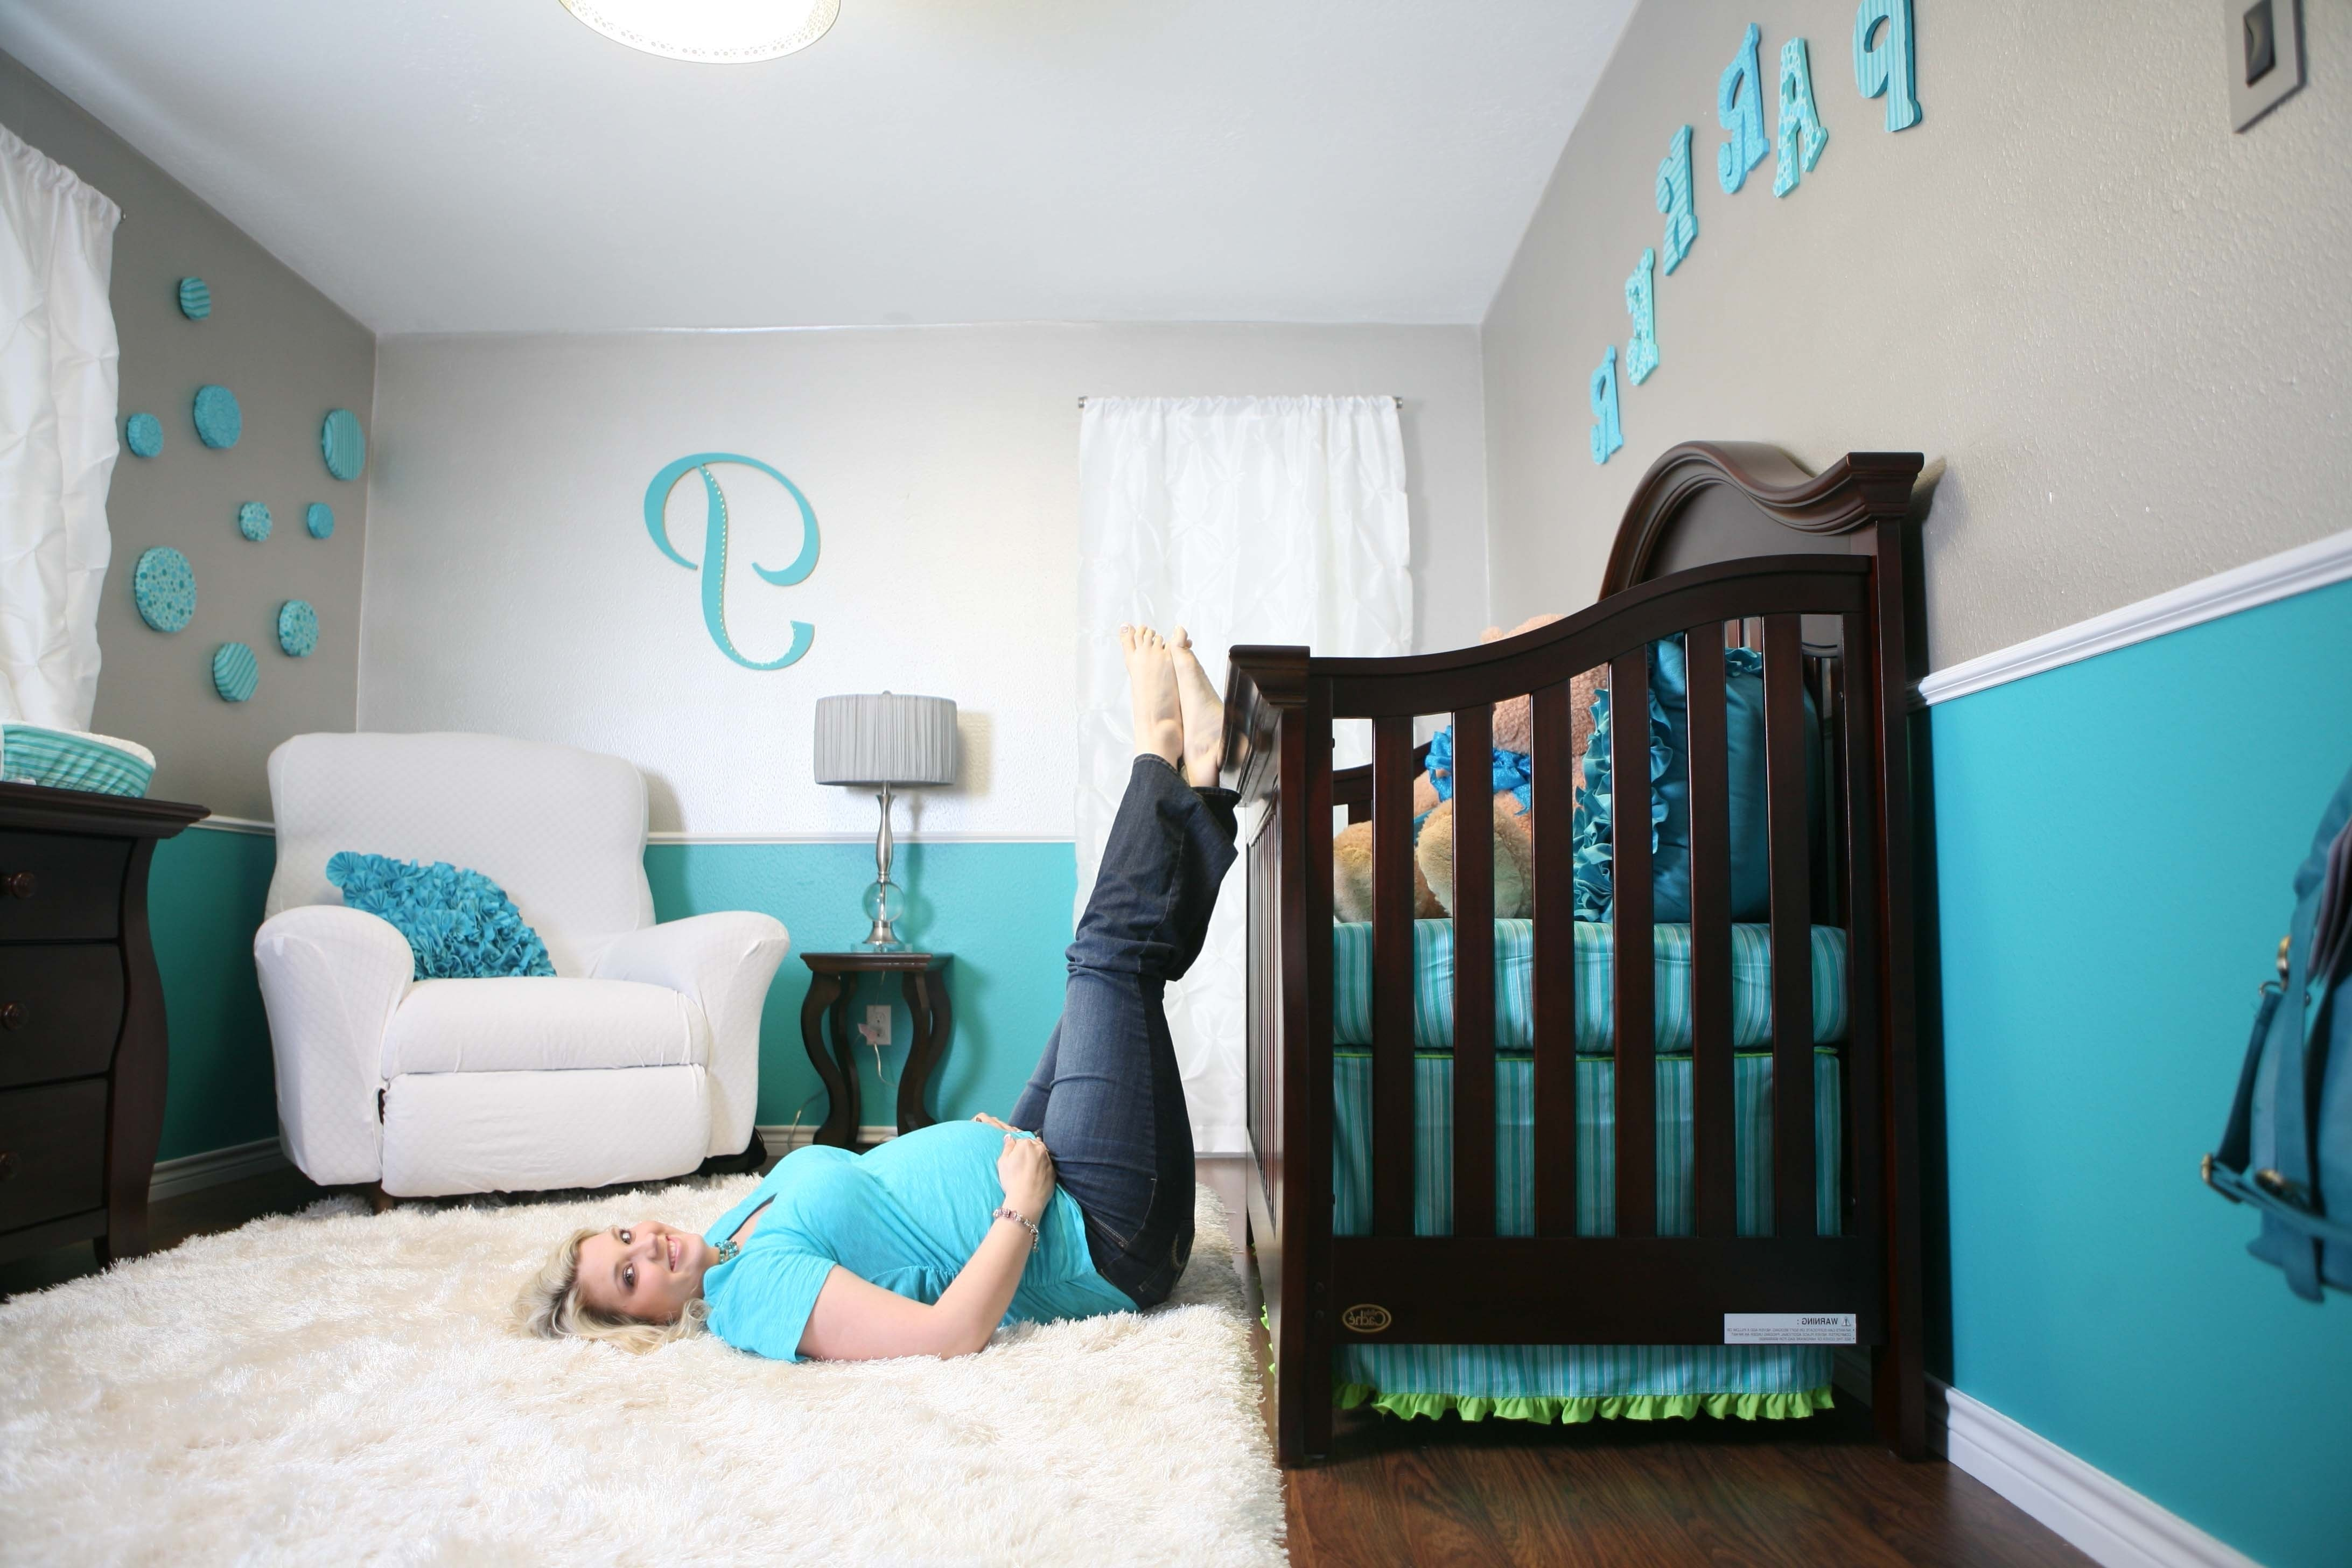 10 Elegant Baby Boy Ideas For Nursery kids room baby nursery themes design ideas rugs unique wall decor 2021